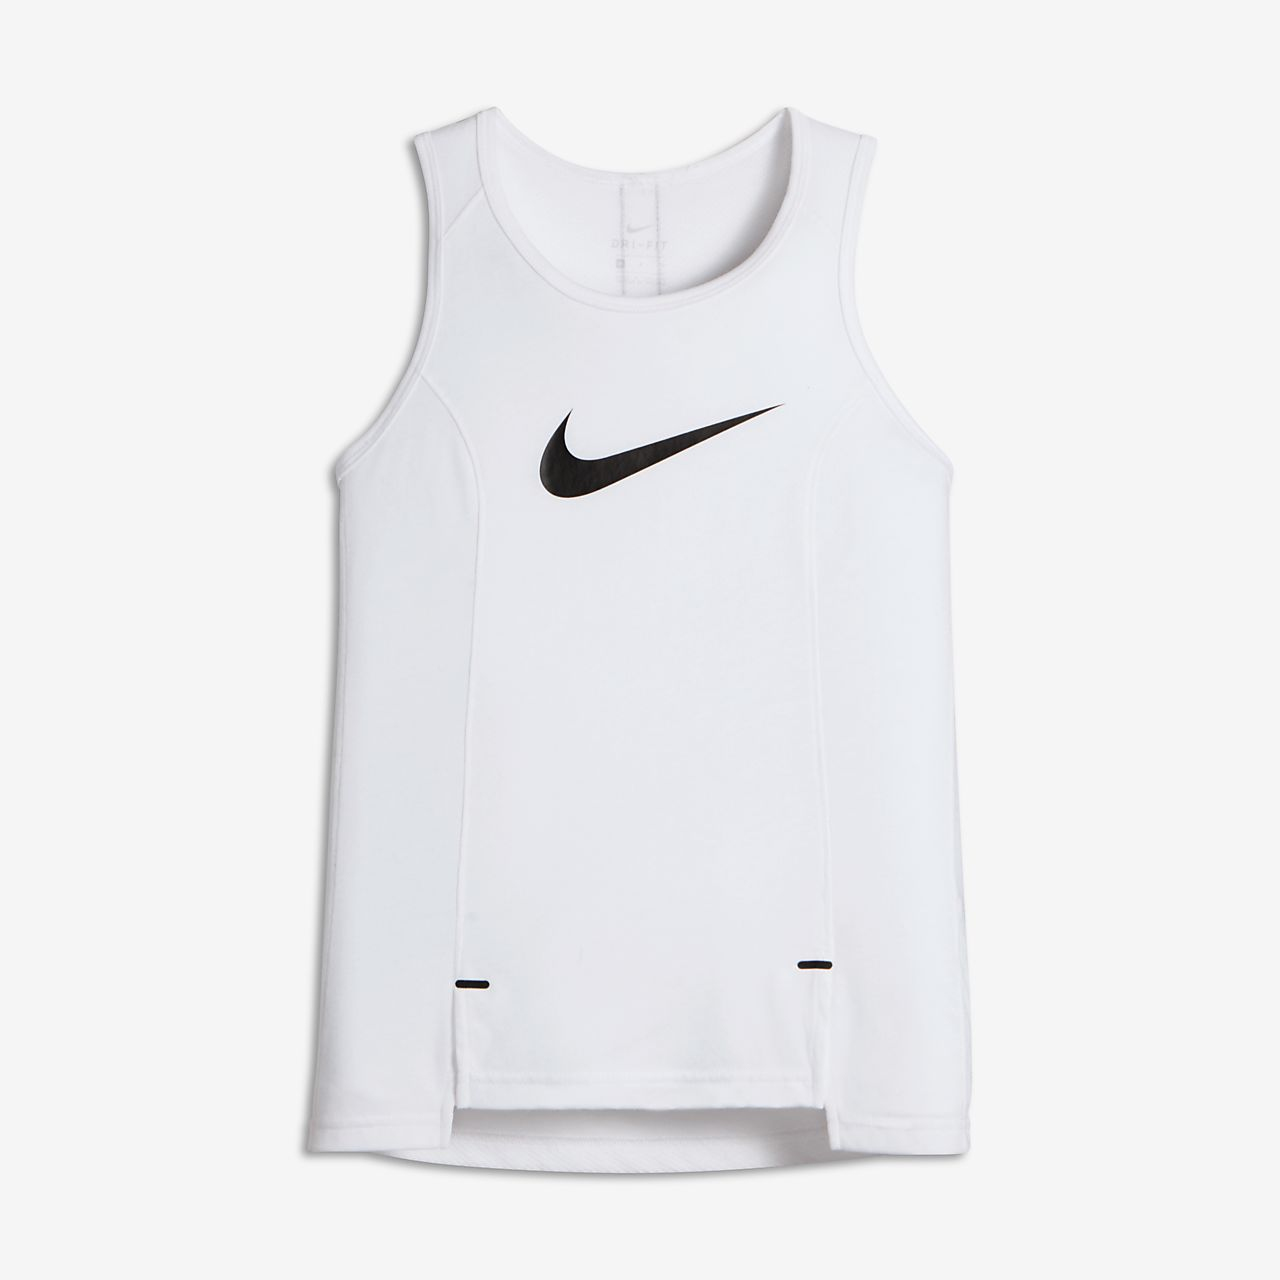 Nike Dry Big Kids' Basketball Tank Tops White/Black